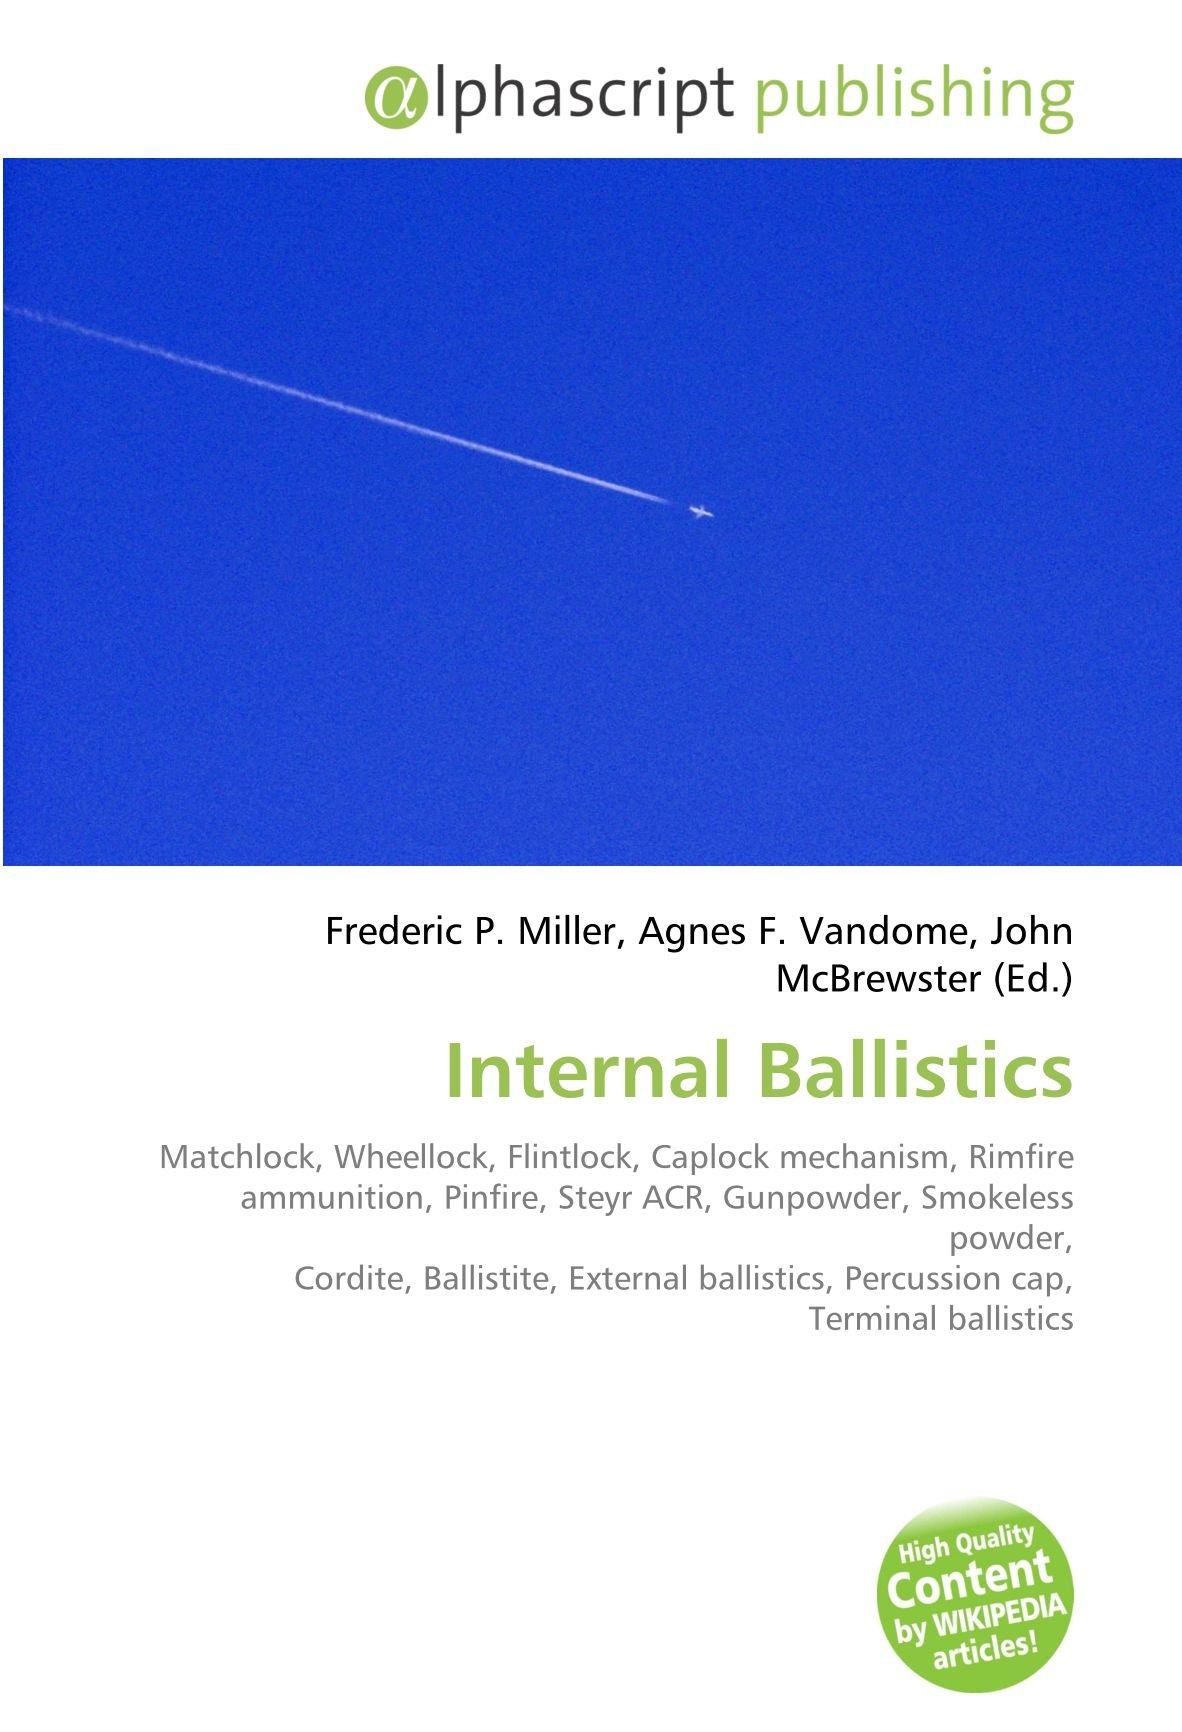 Internal Ballistics: Matchlock, Wheellock, Flintlock